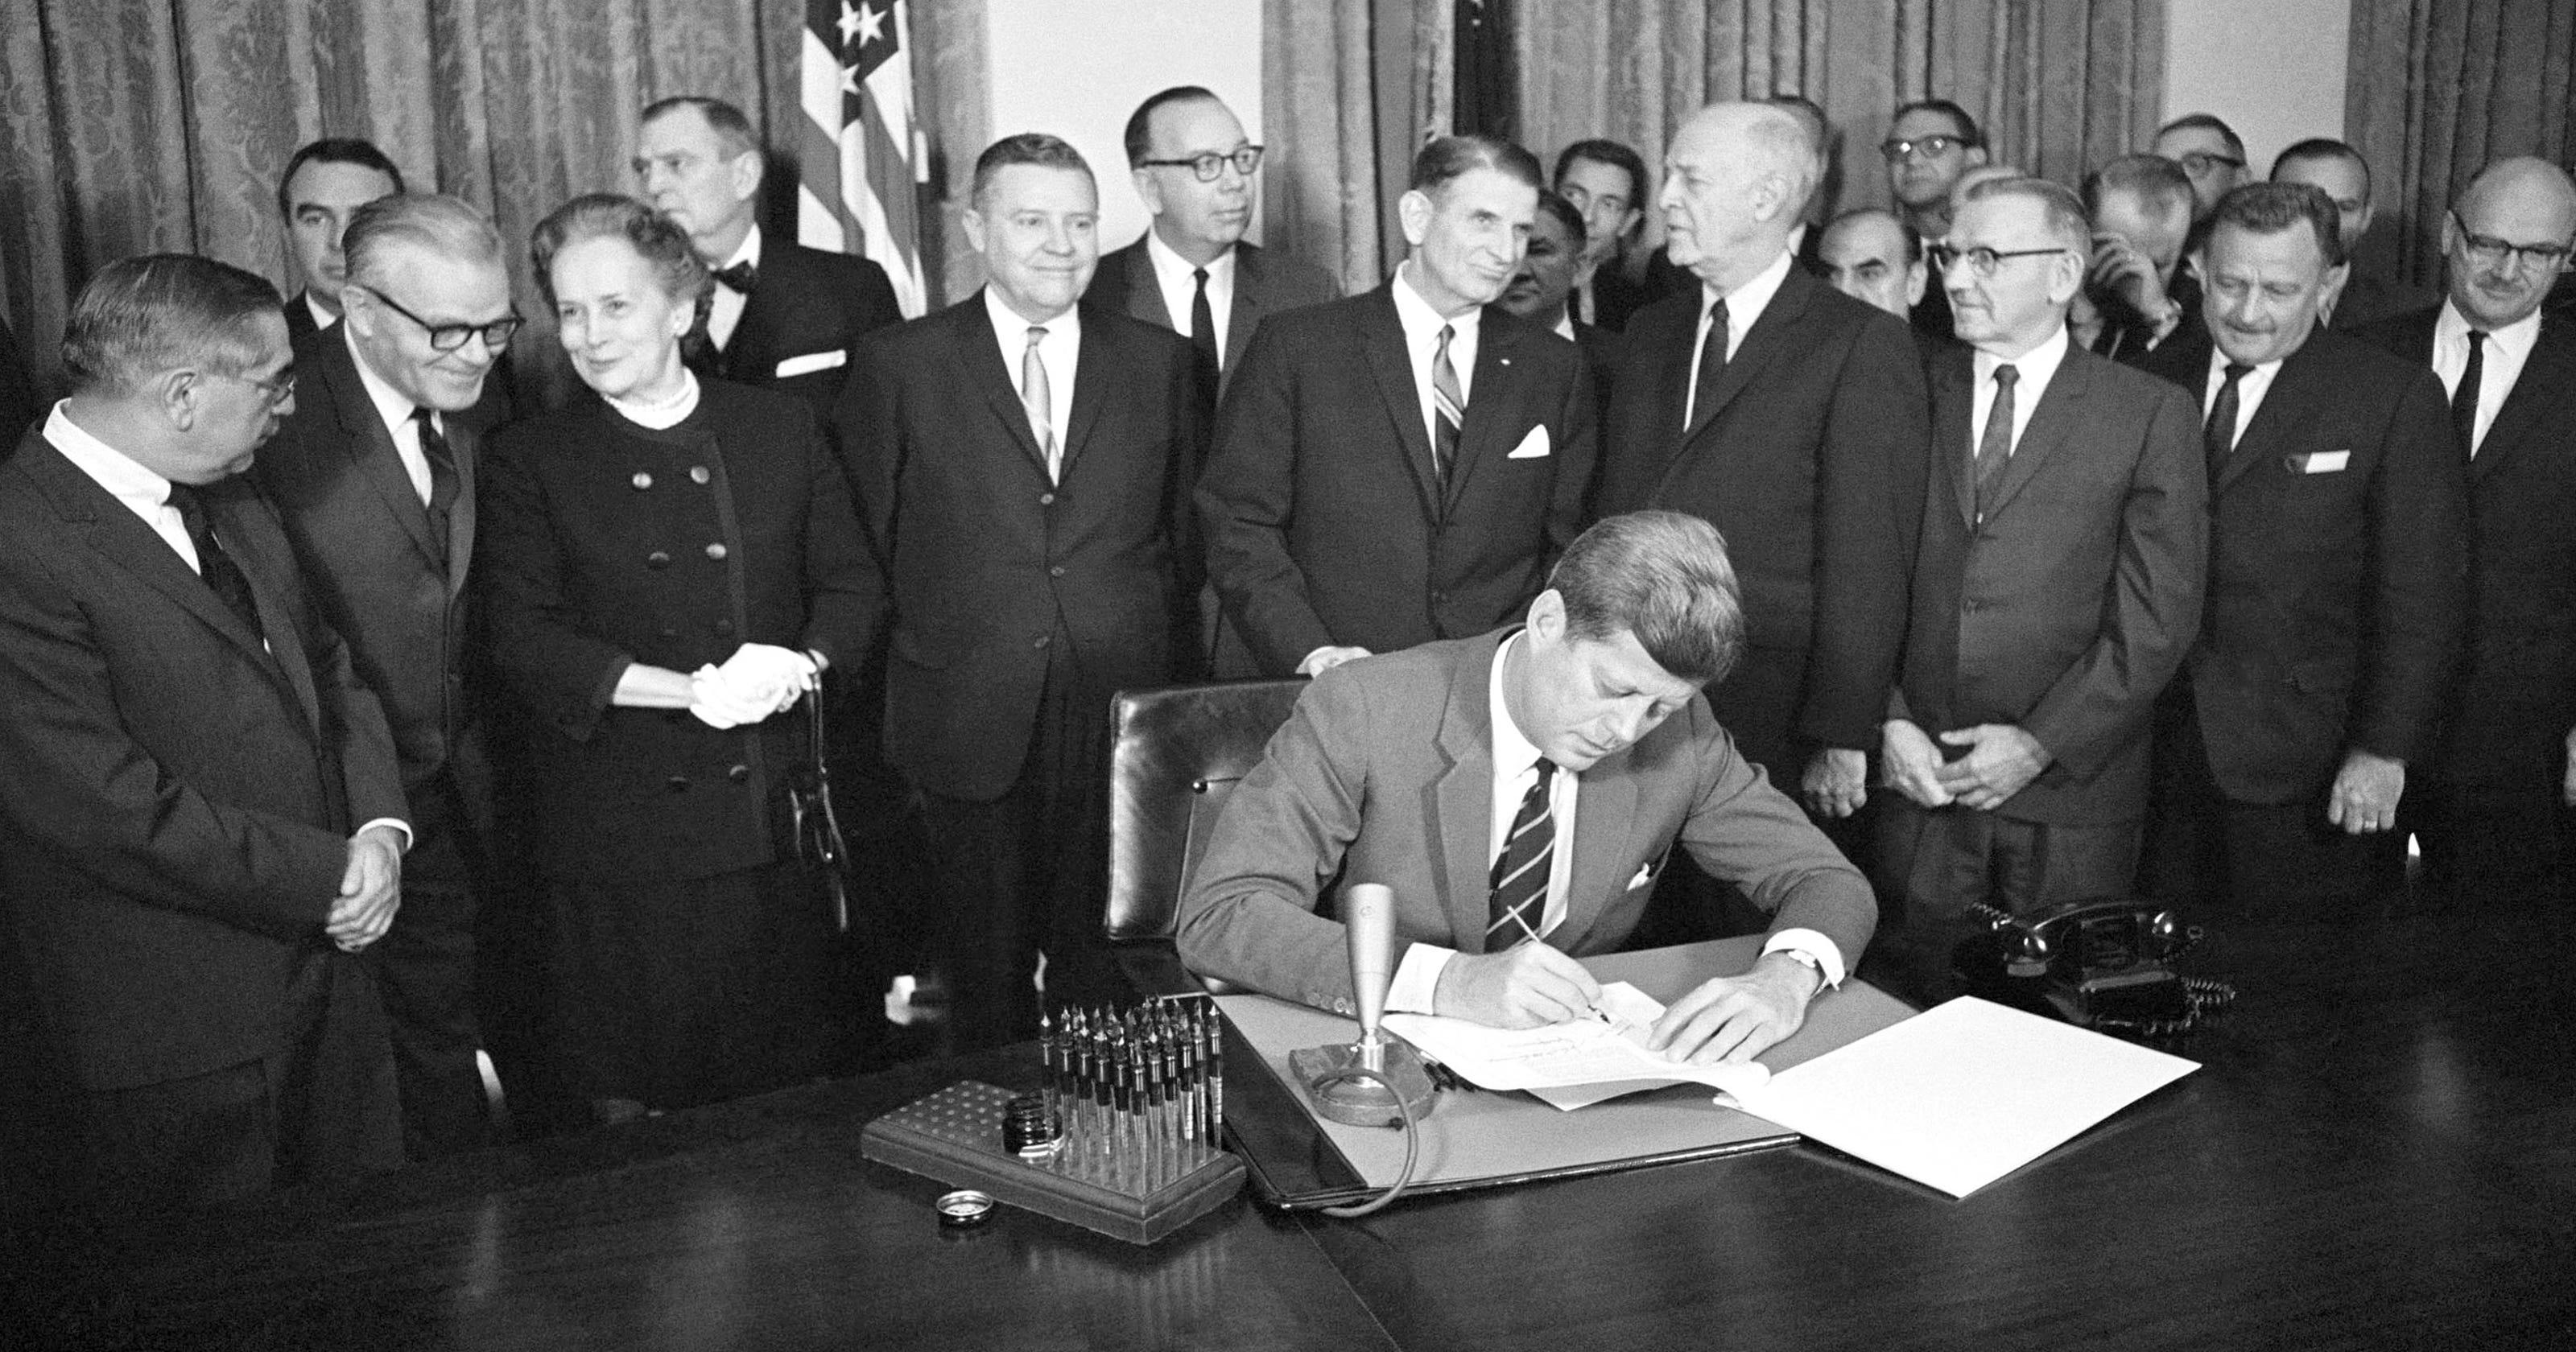 JFK's vision for mental health care languishing?